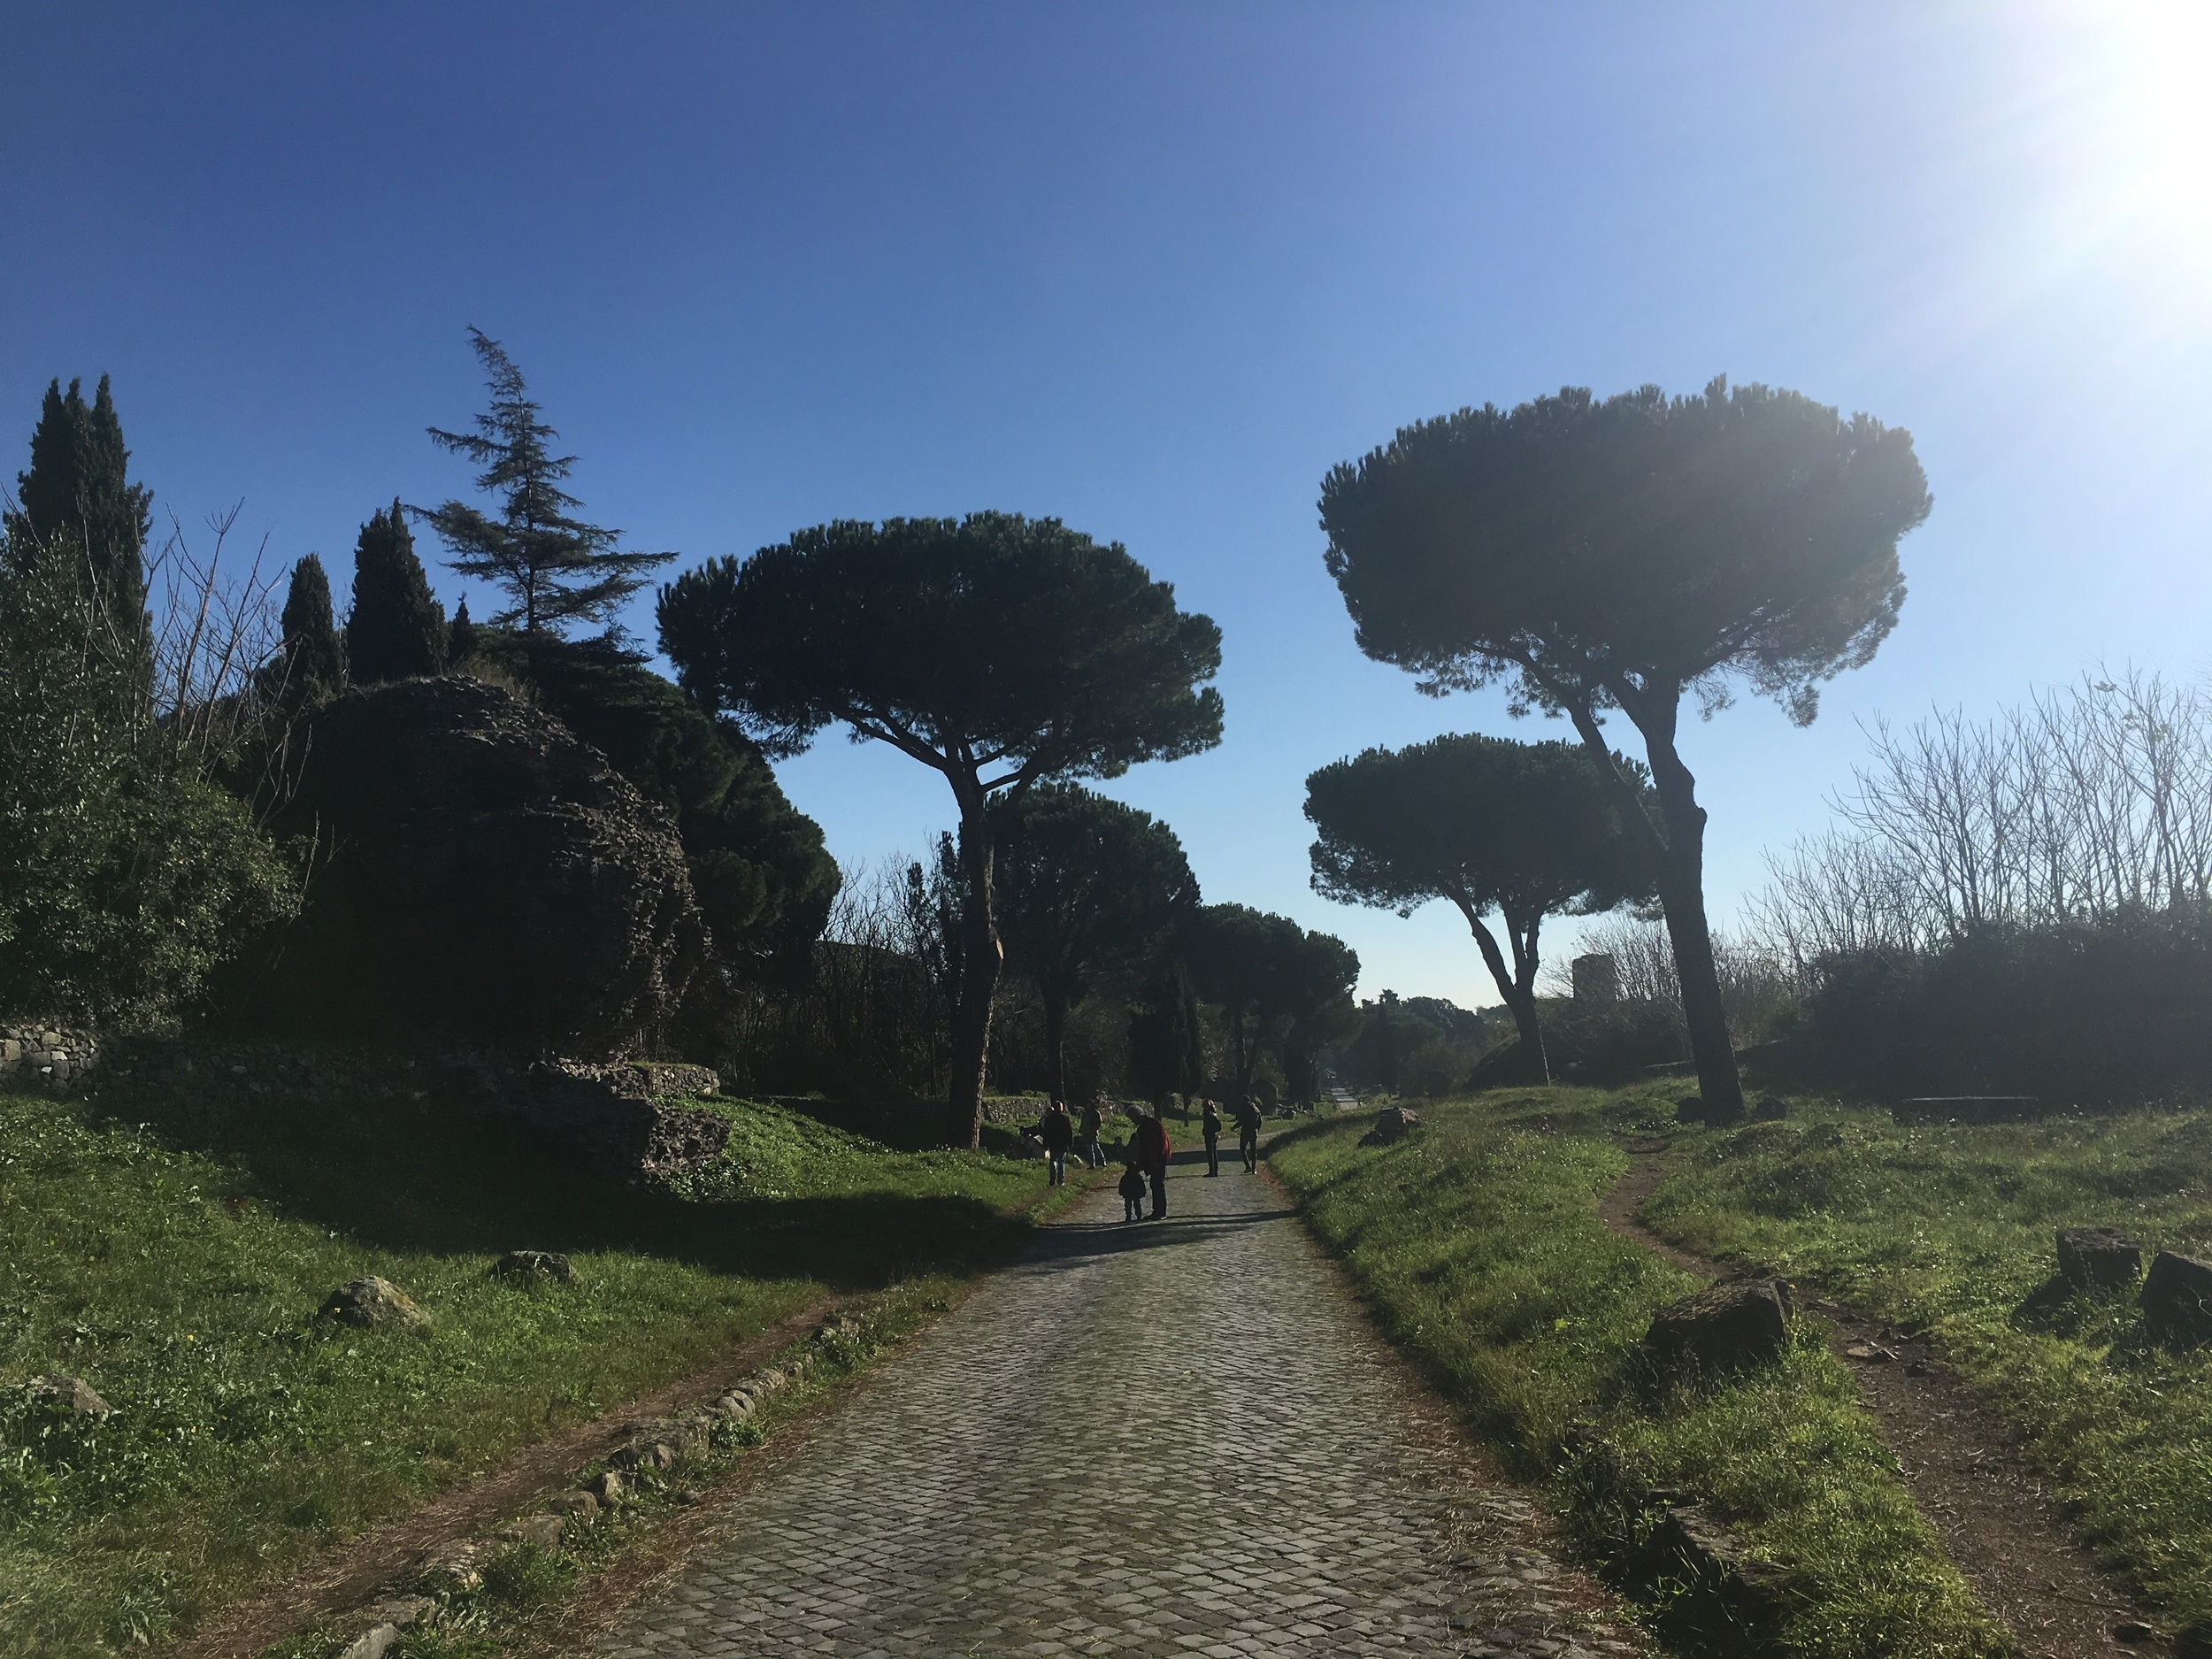 The Appian Way, Rome